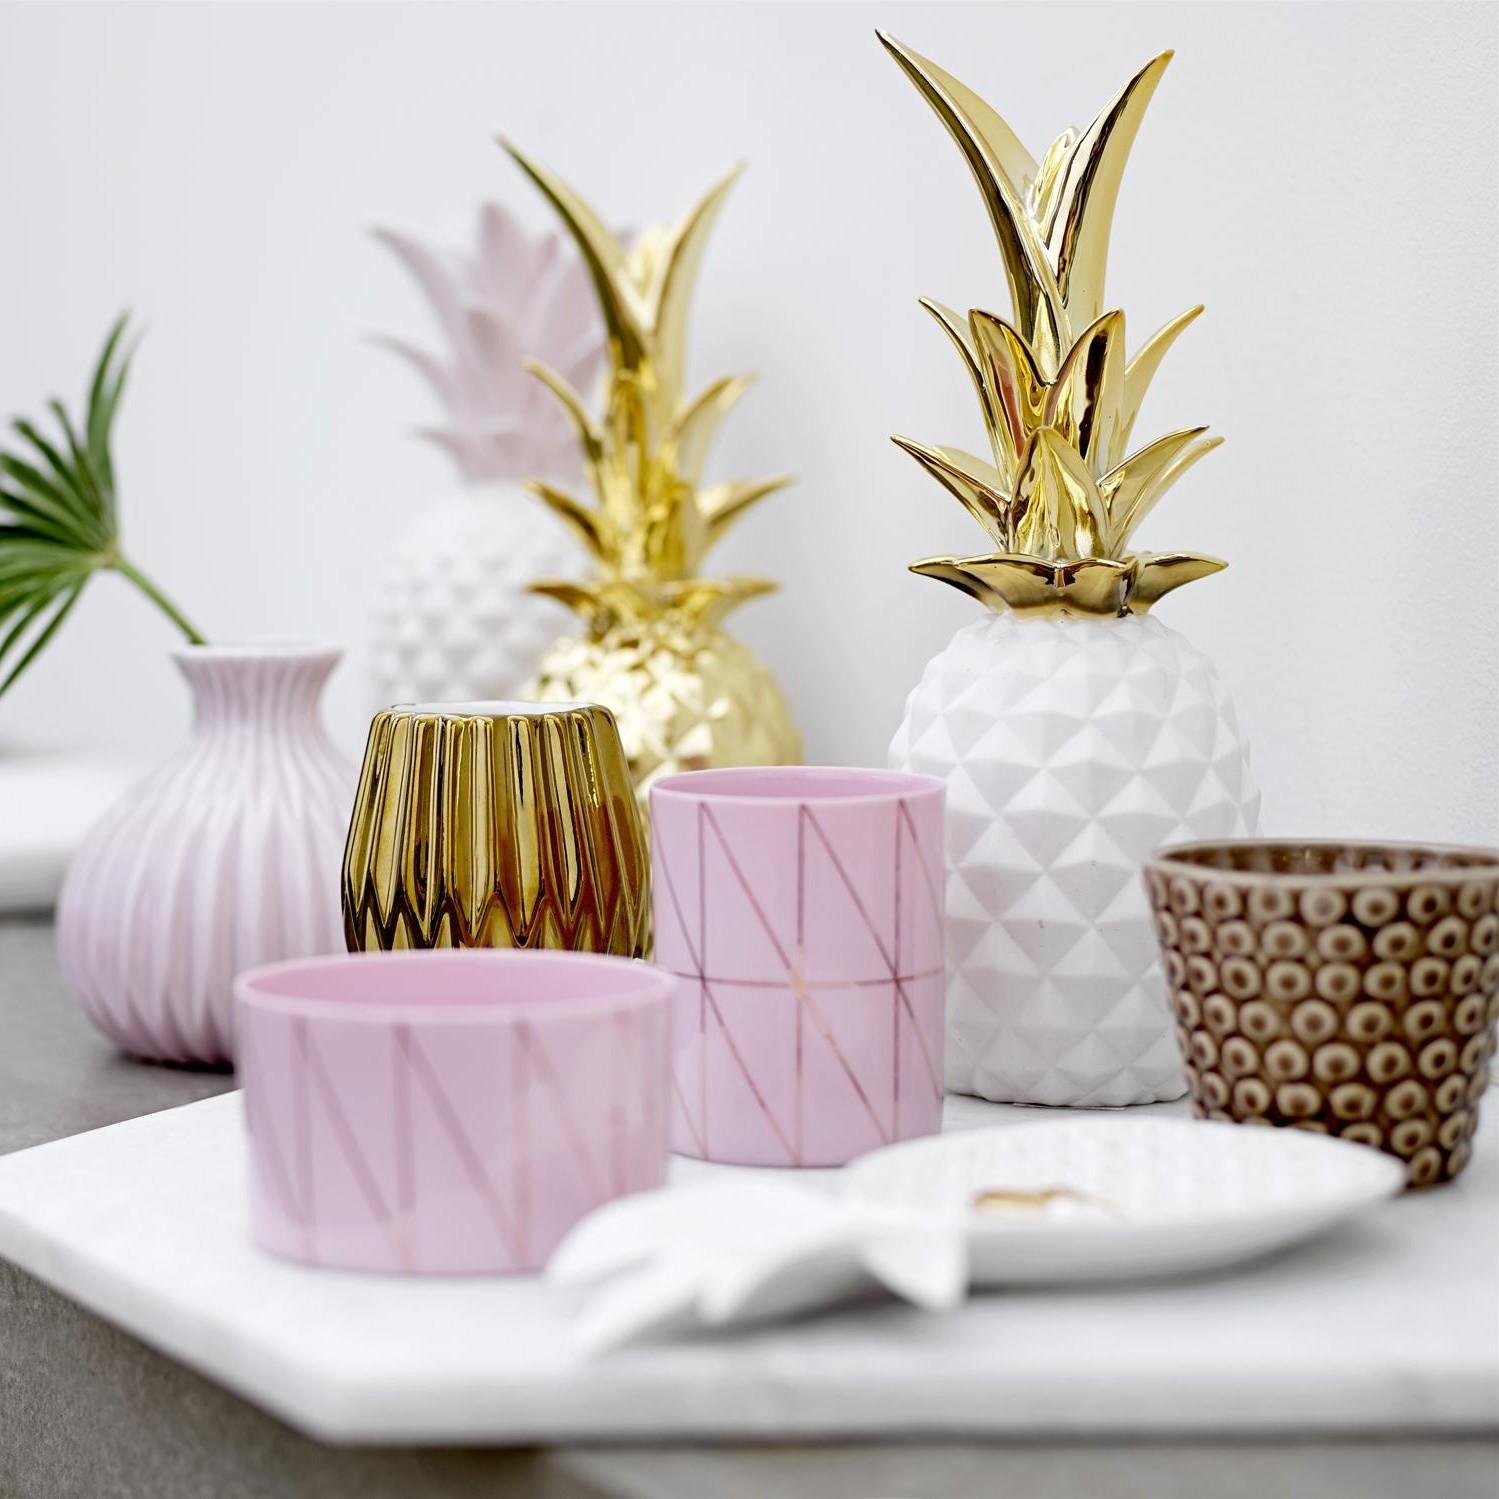 bloomingville objet de d coration ananas ambientedirect. Black Bedroom Furniture Sets. Home Design Ideas